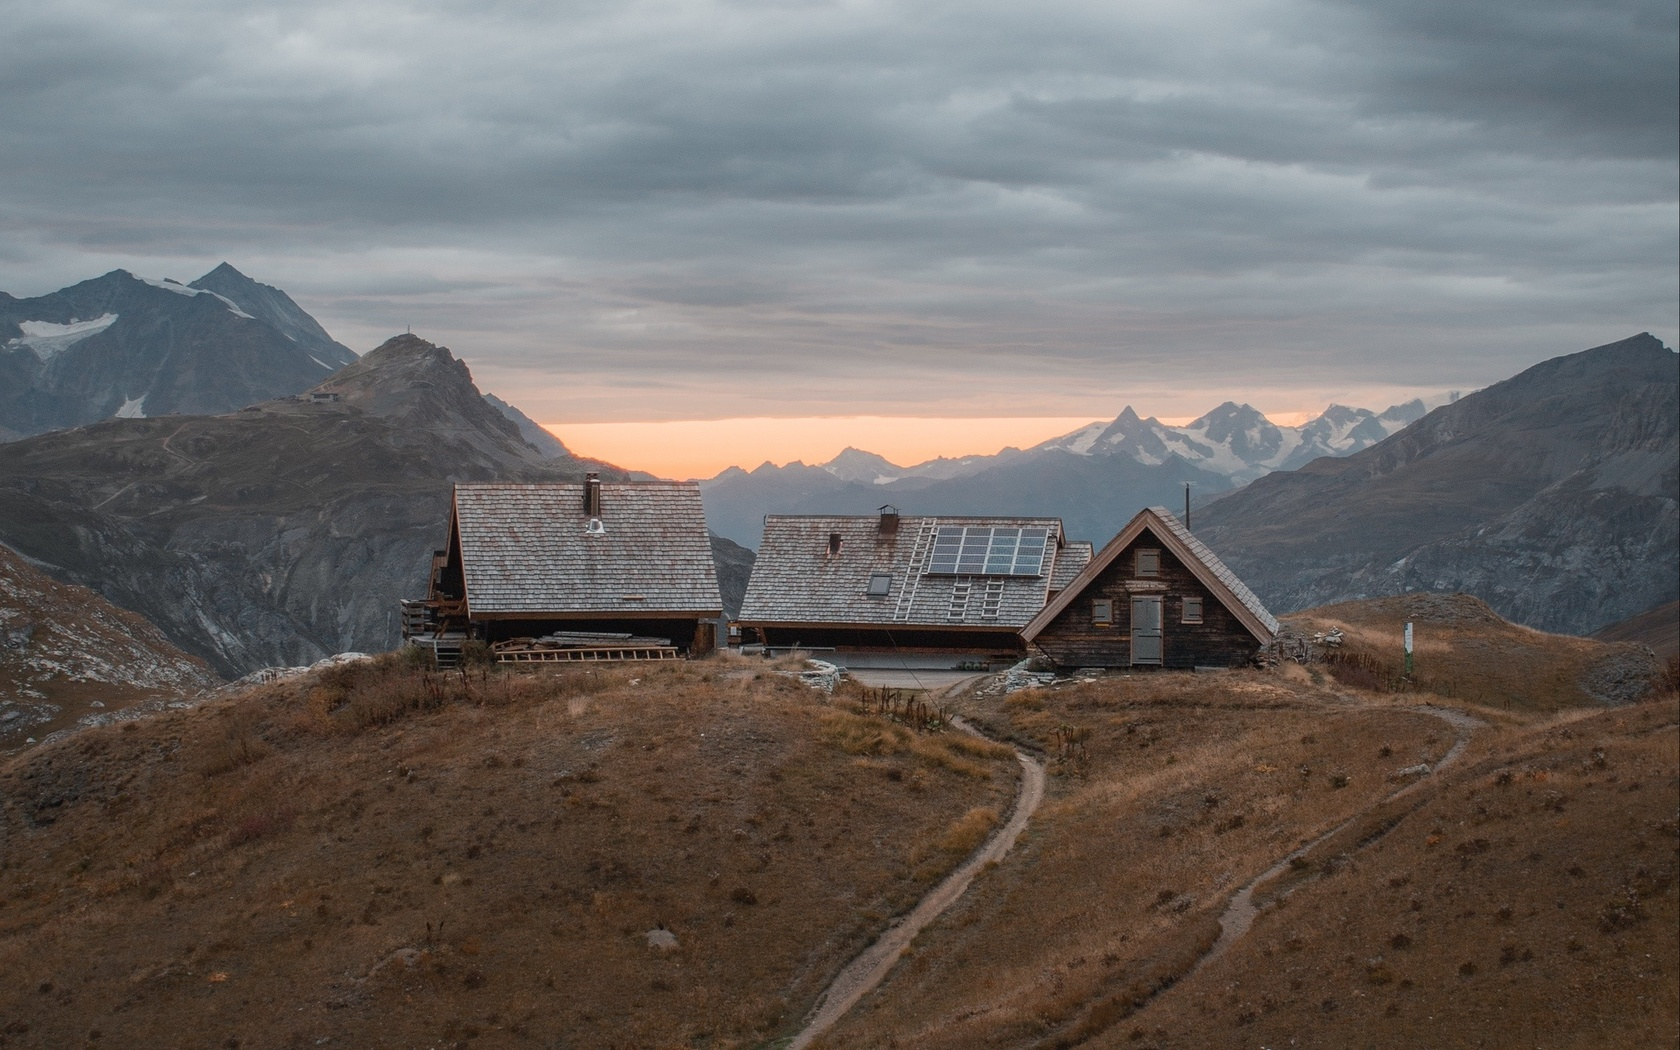 горы, дома, поселок